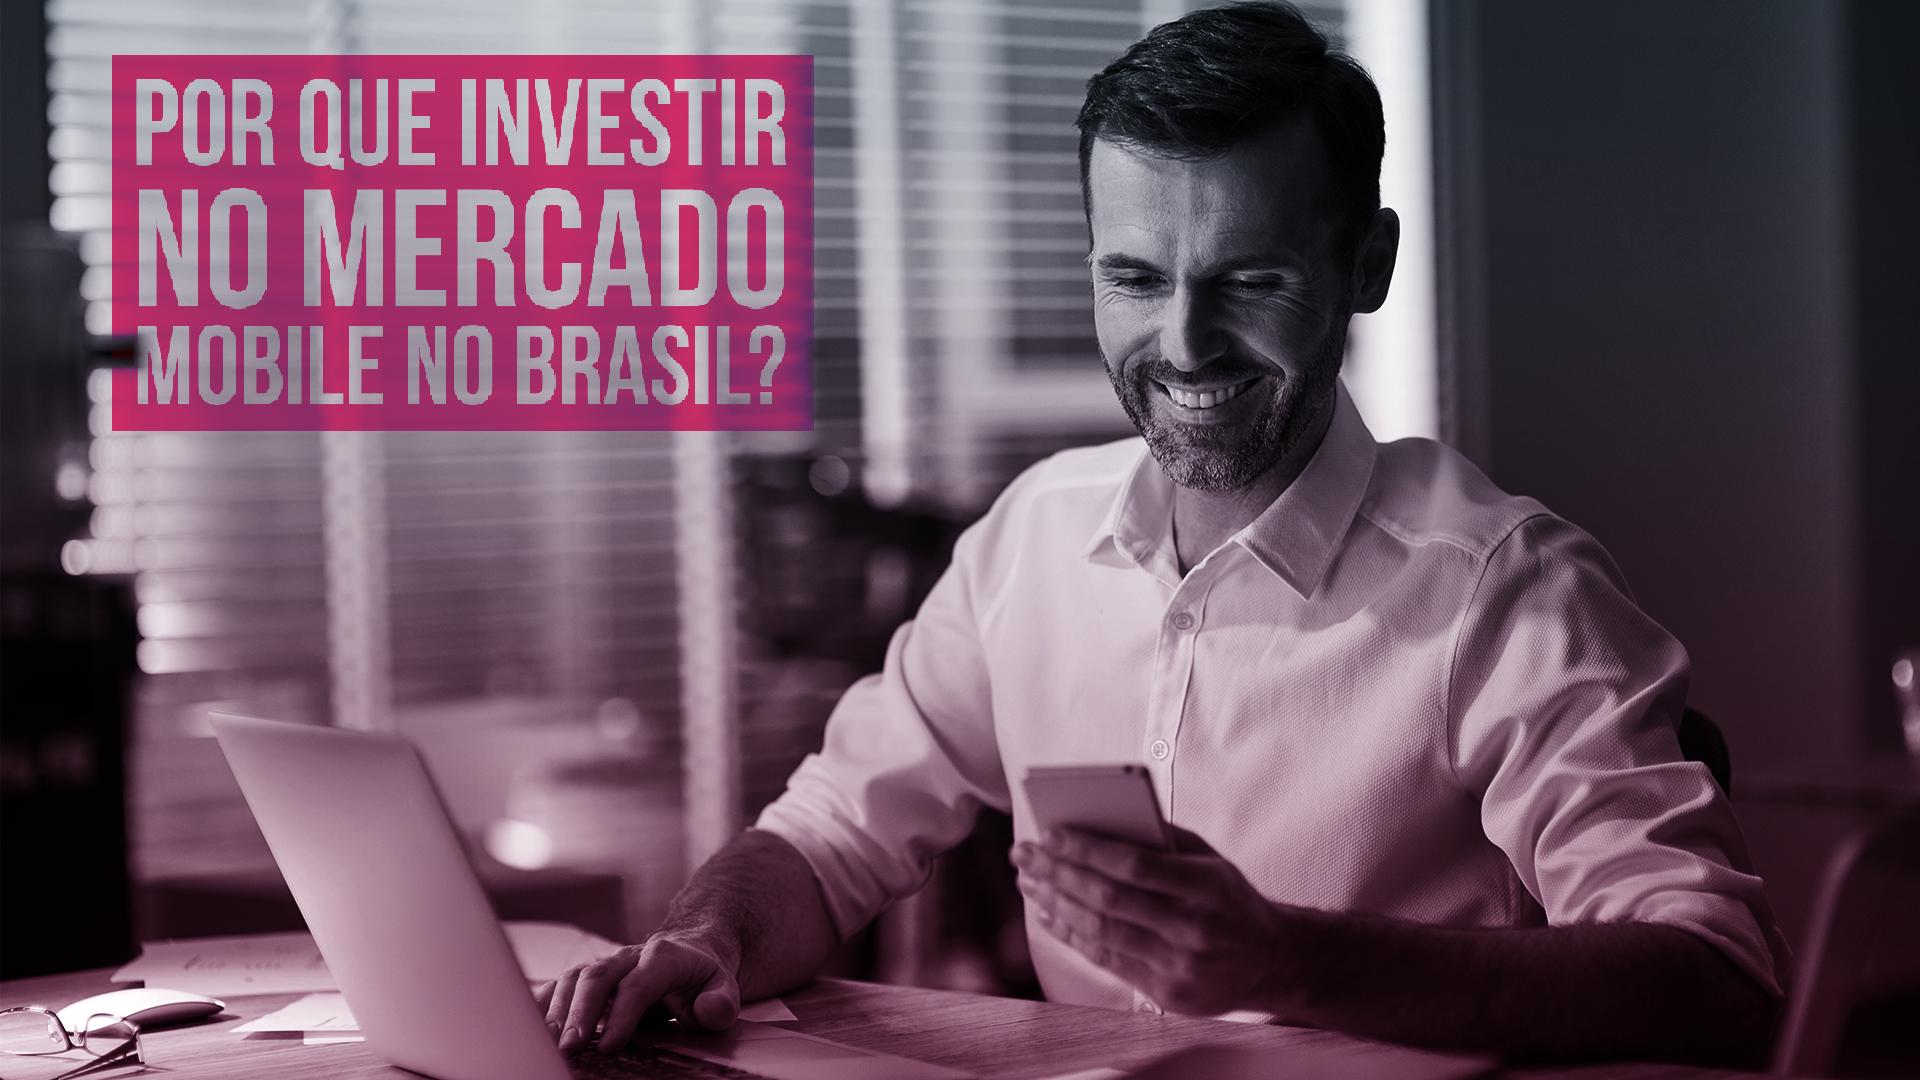 Por que investir no mercado mobile no Brasil?